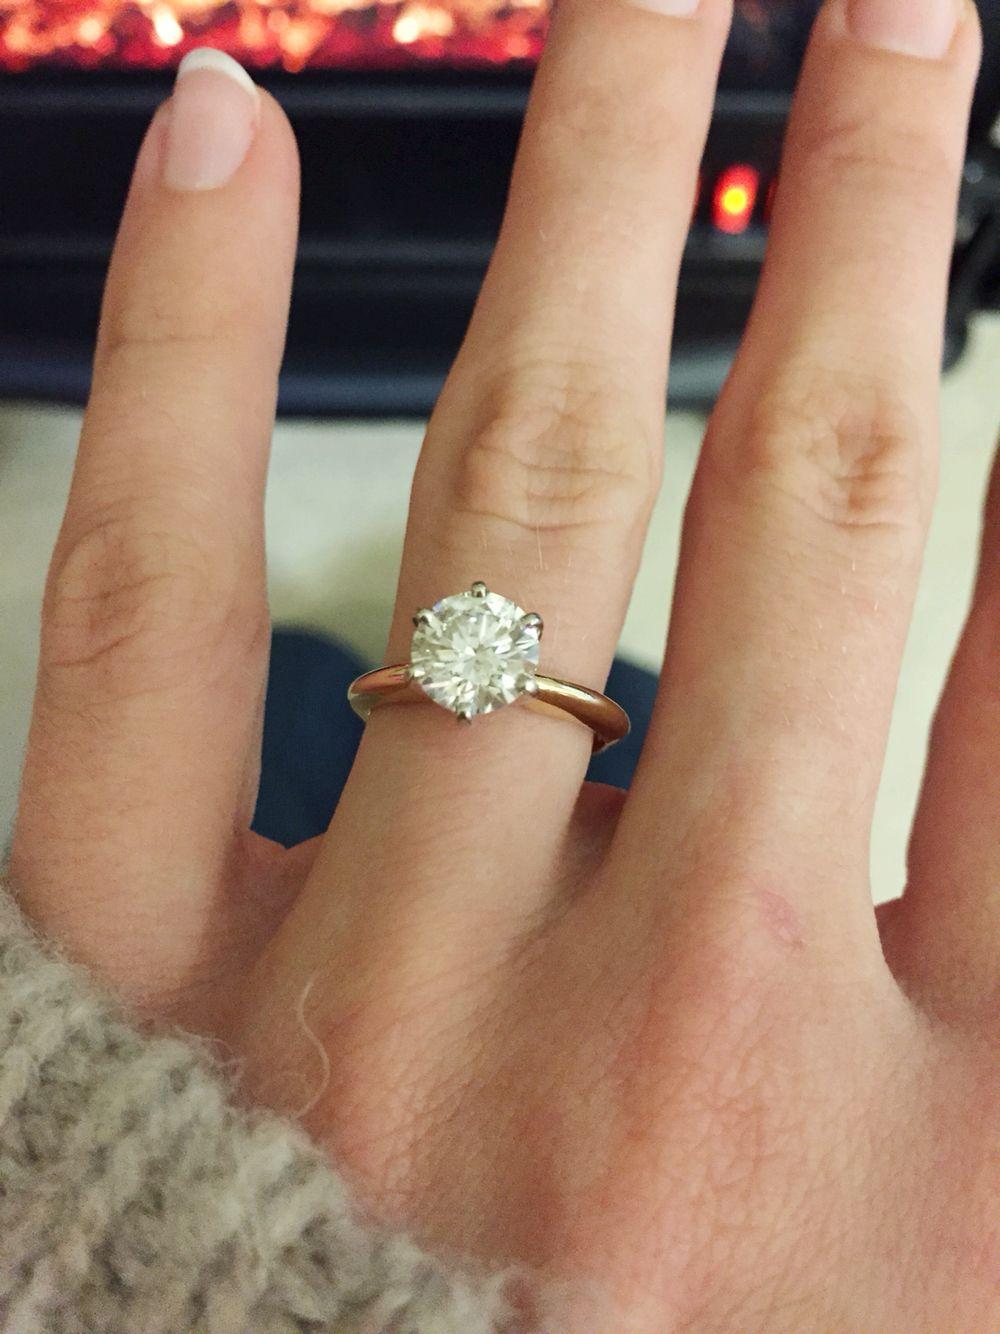 Engagement Ring Solitare Rounddiamond Goldband My Engagement Ring Engagement Rings Engagement